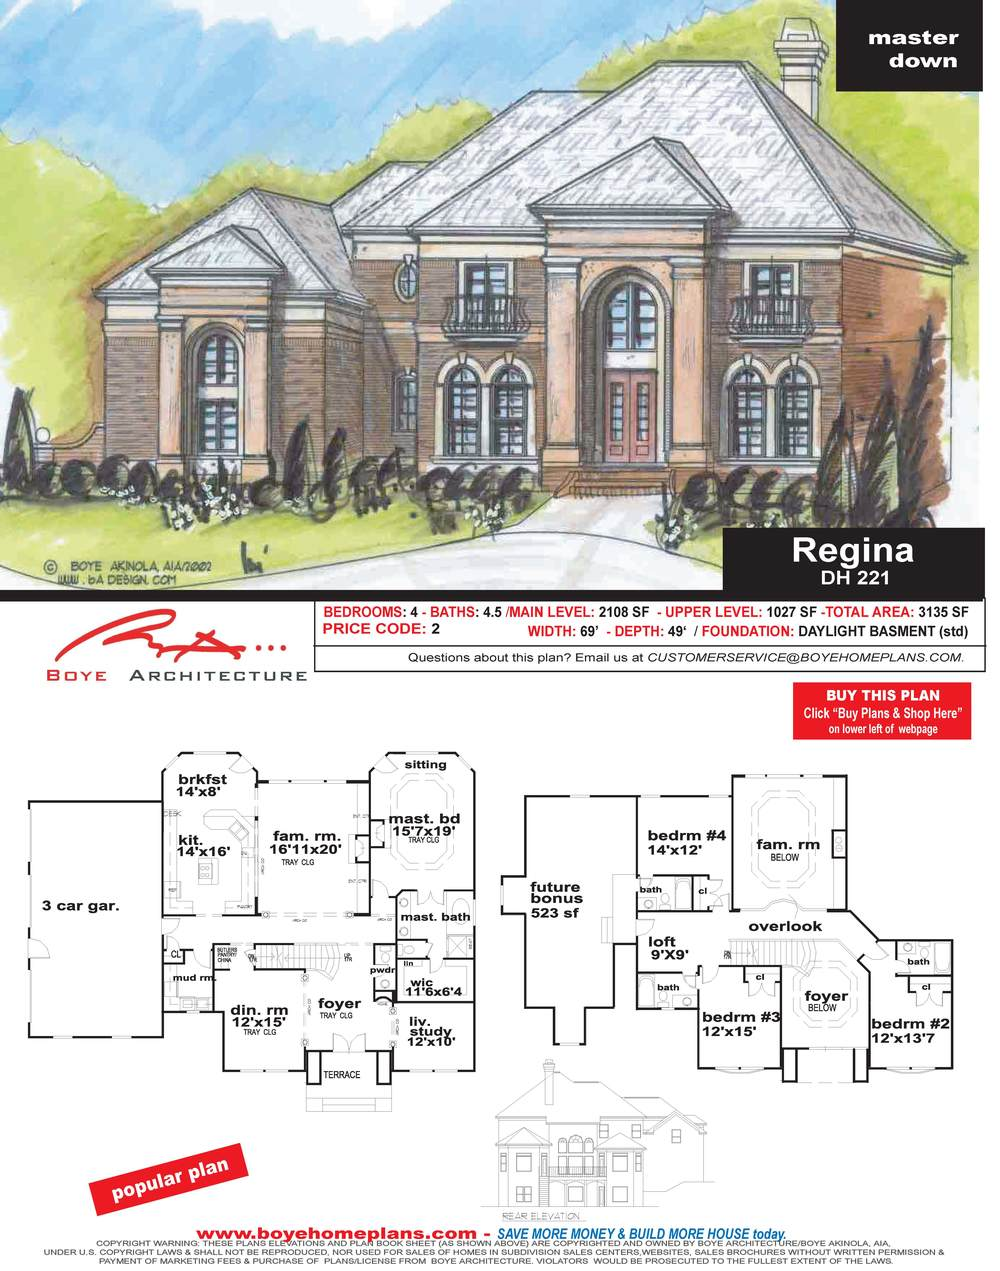 REGINA PLAN PAGE-DH 221-061508.jpg